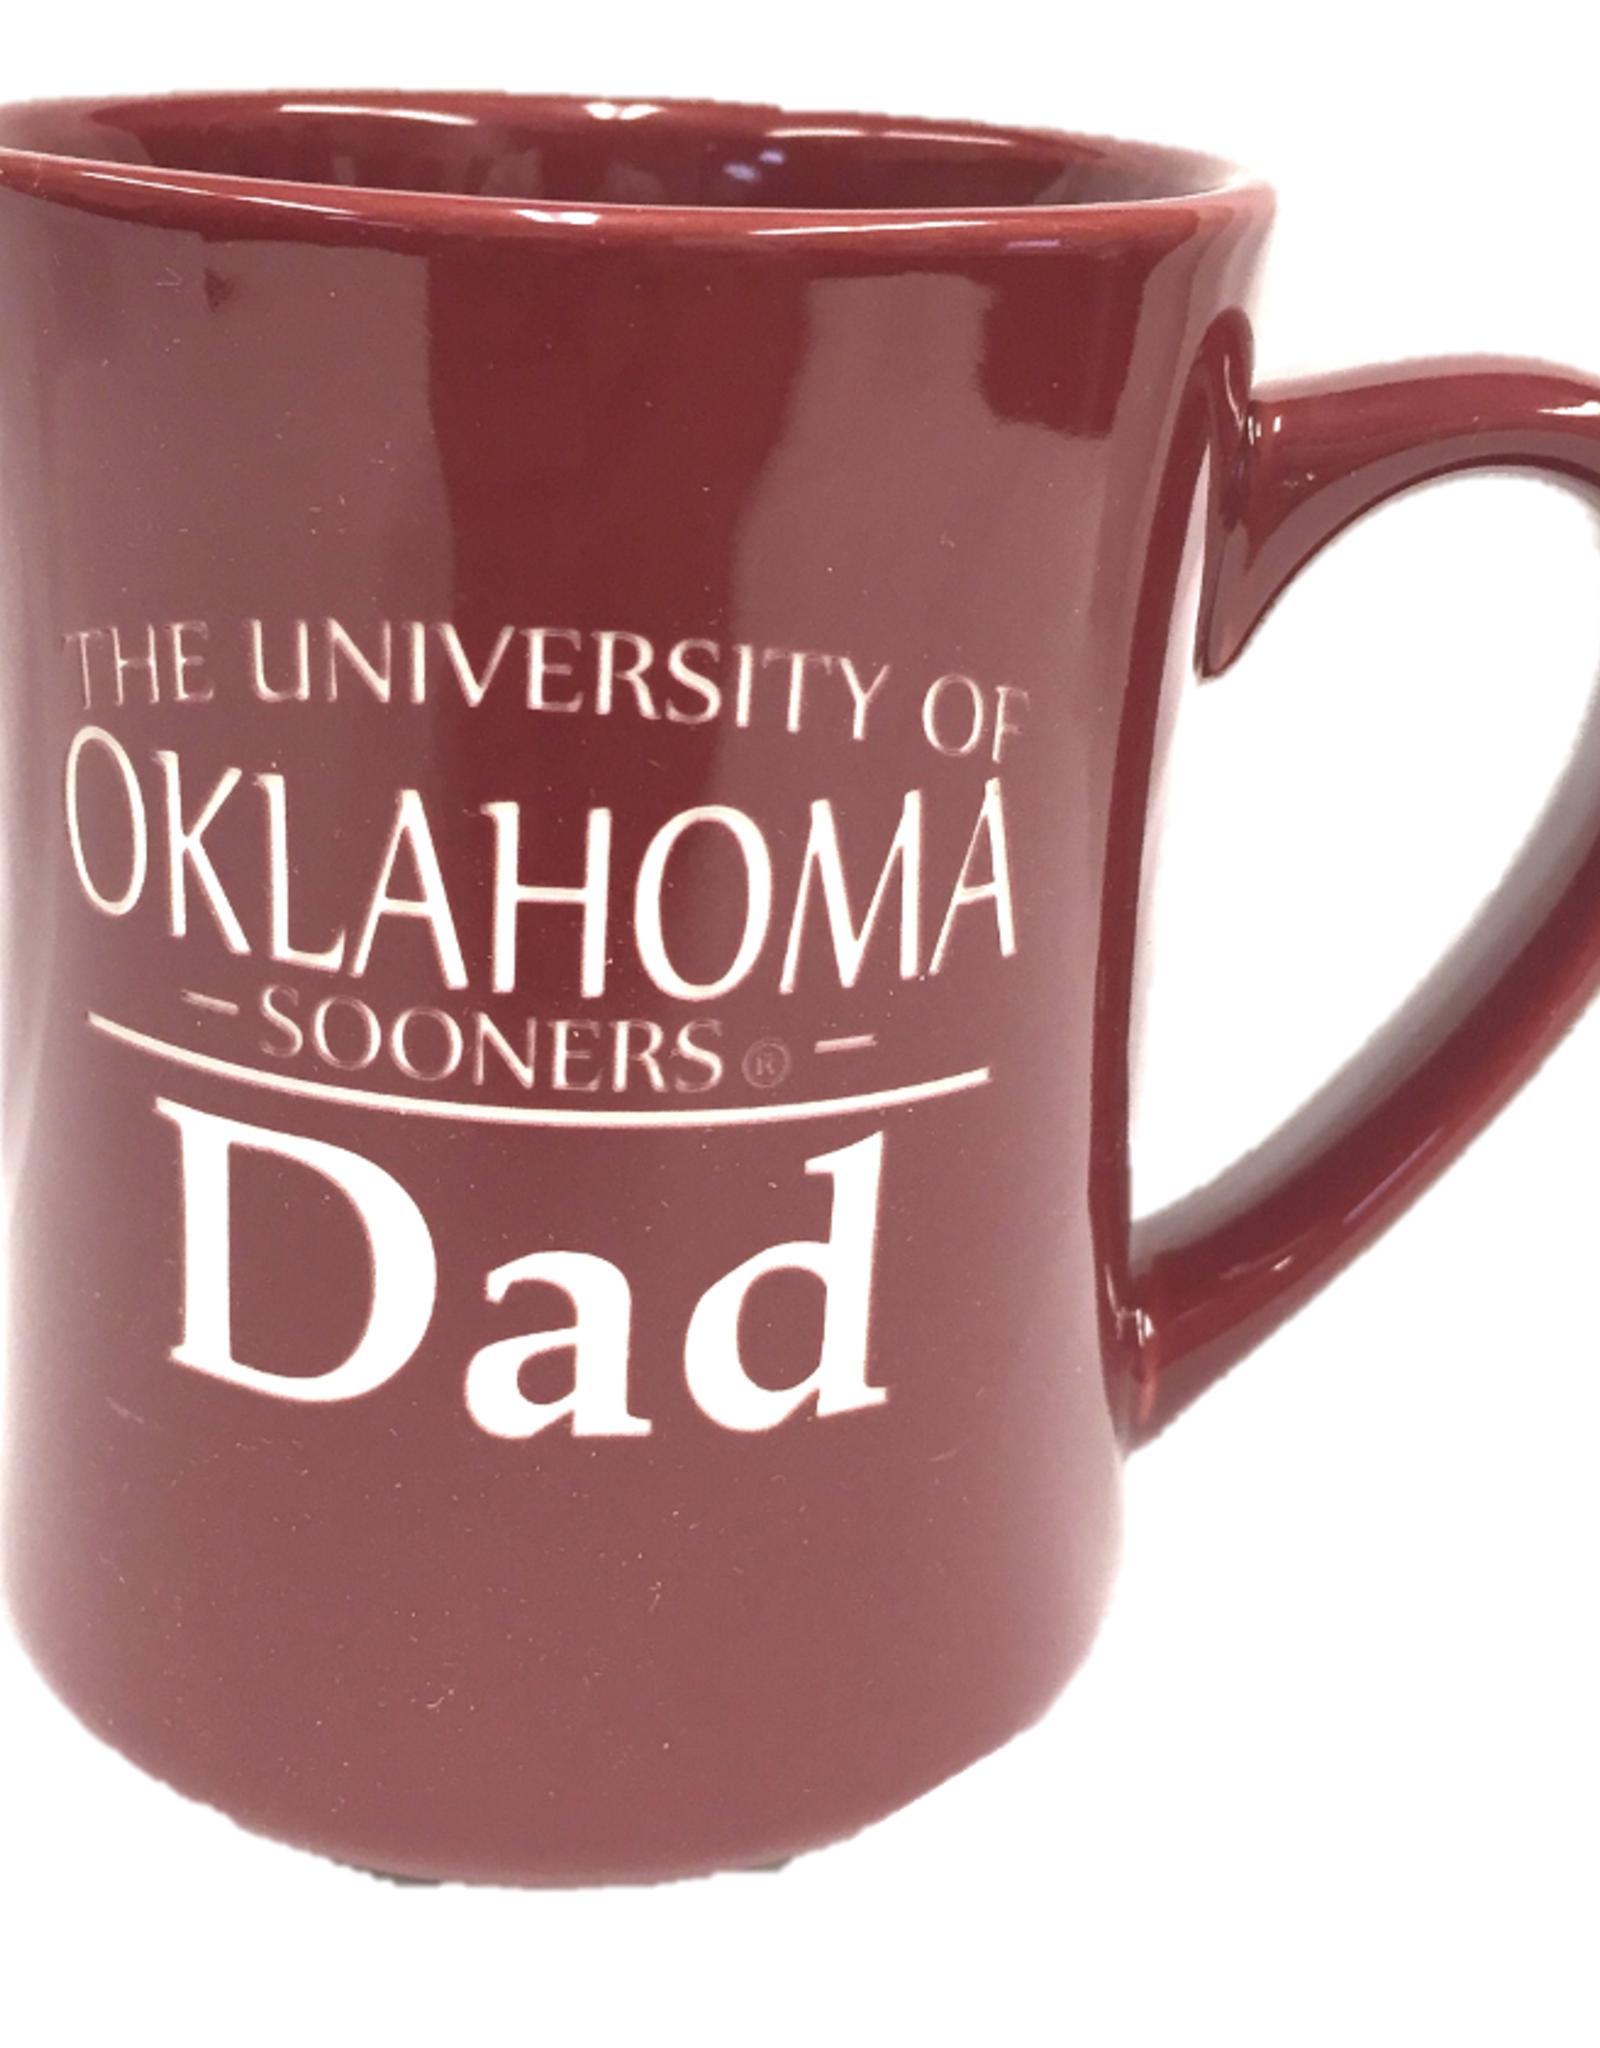 RFSJ 16oz Ceramic Etched Oklahoma Sooners Dad Mug